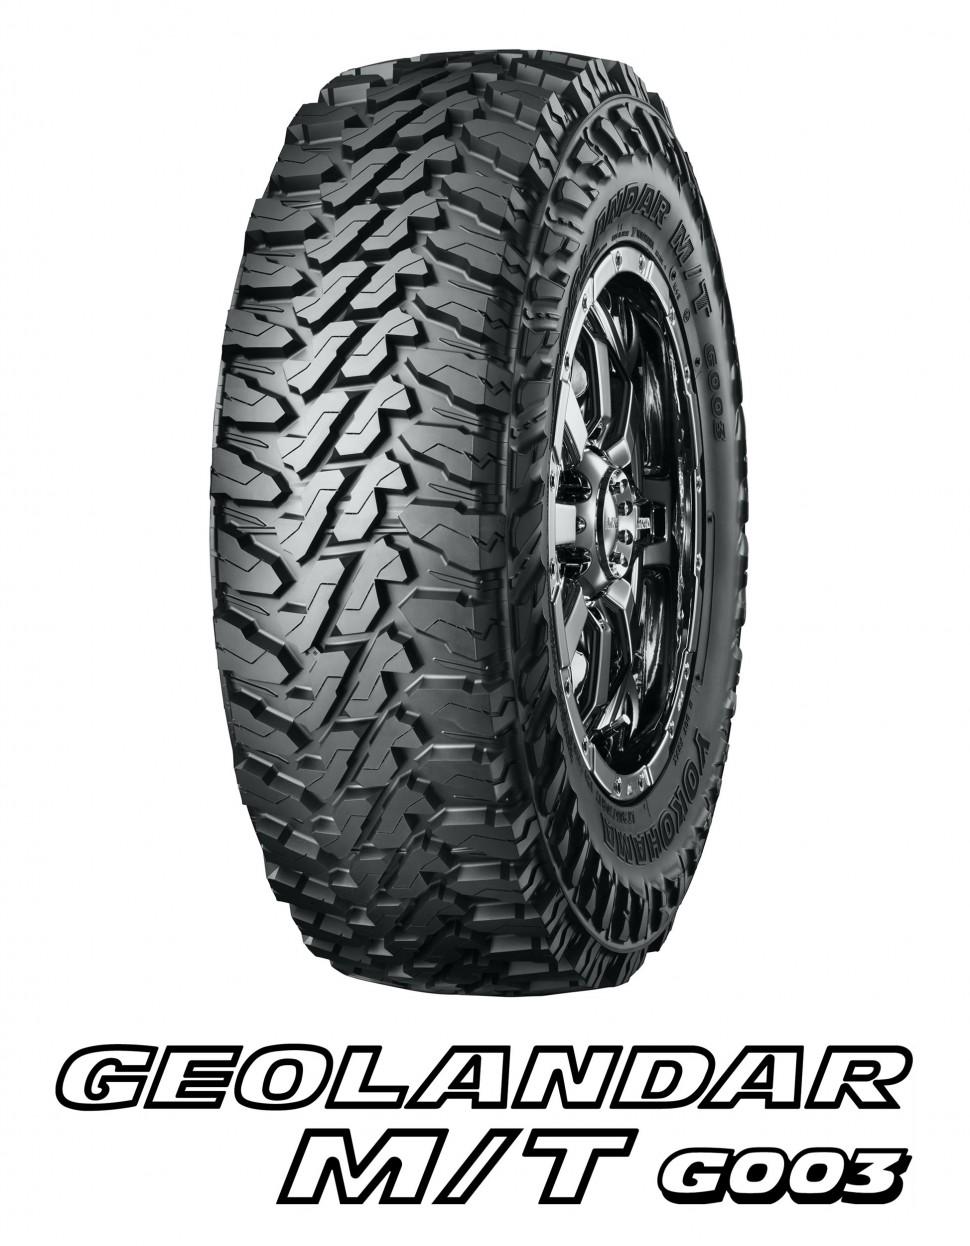 GEOLANDAR MT G003